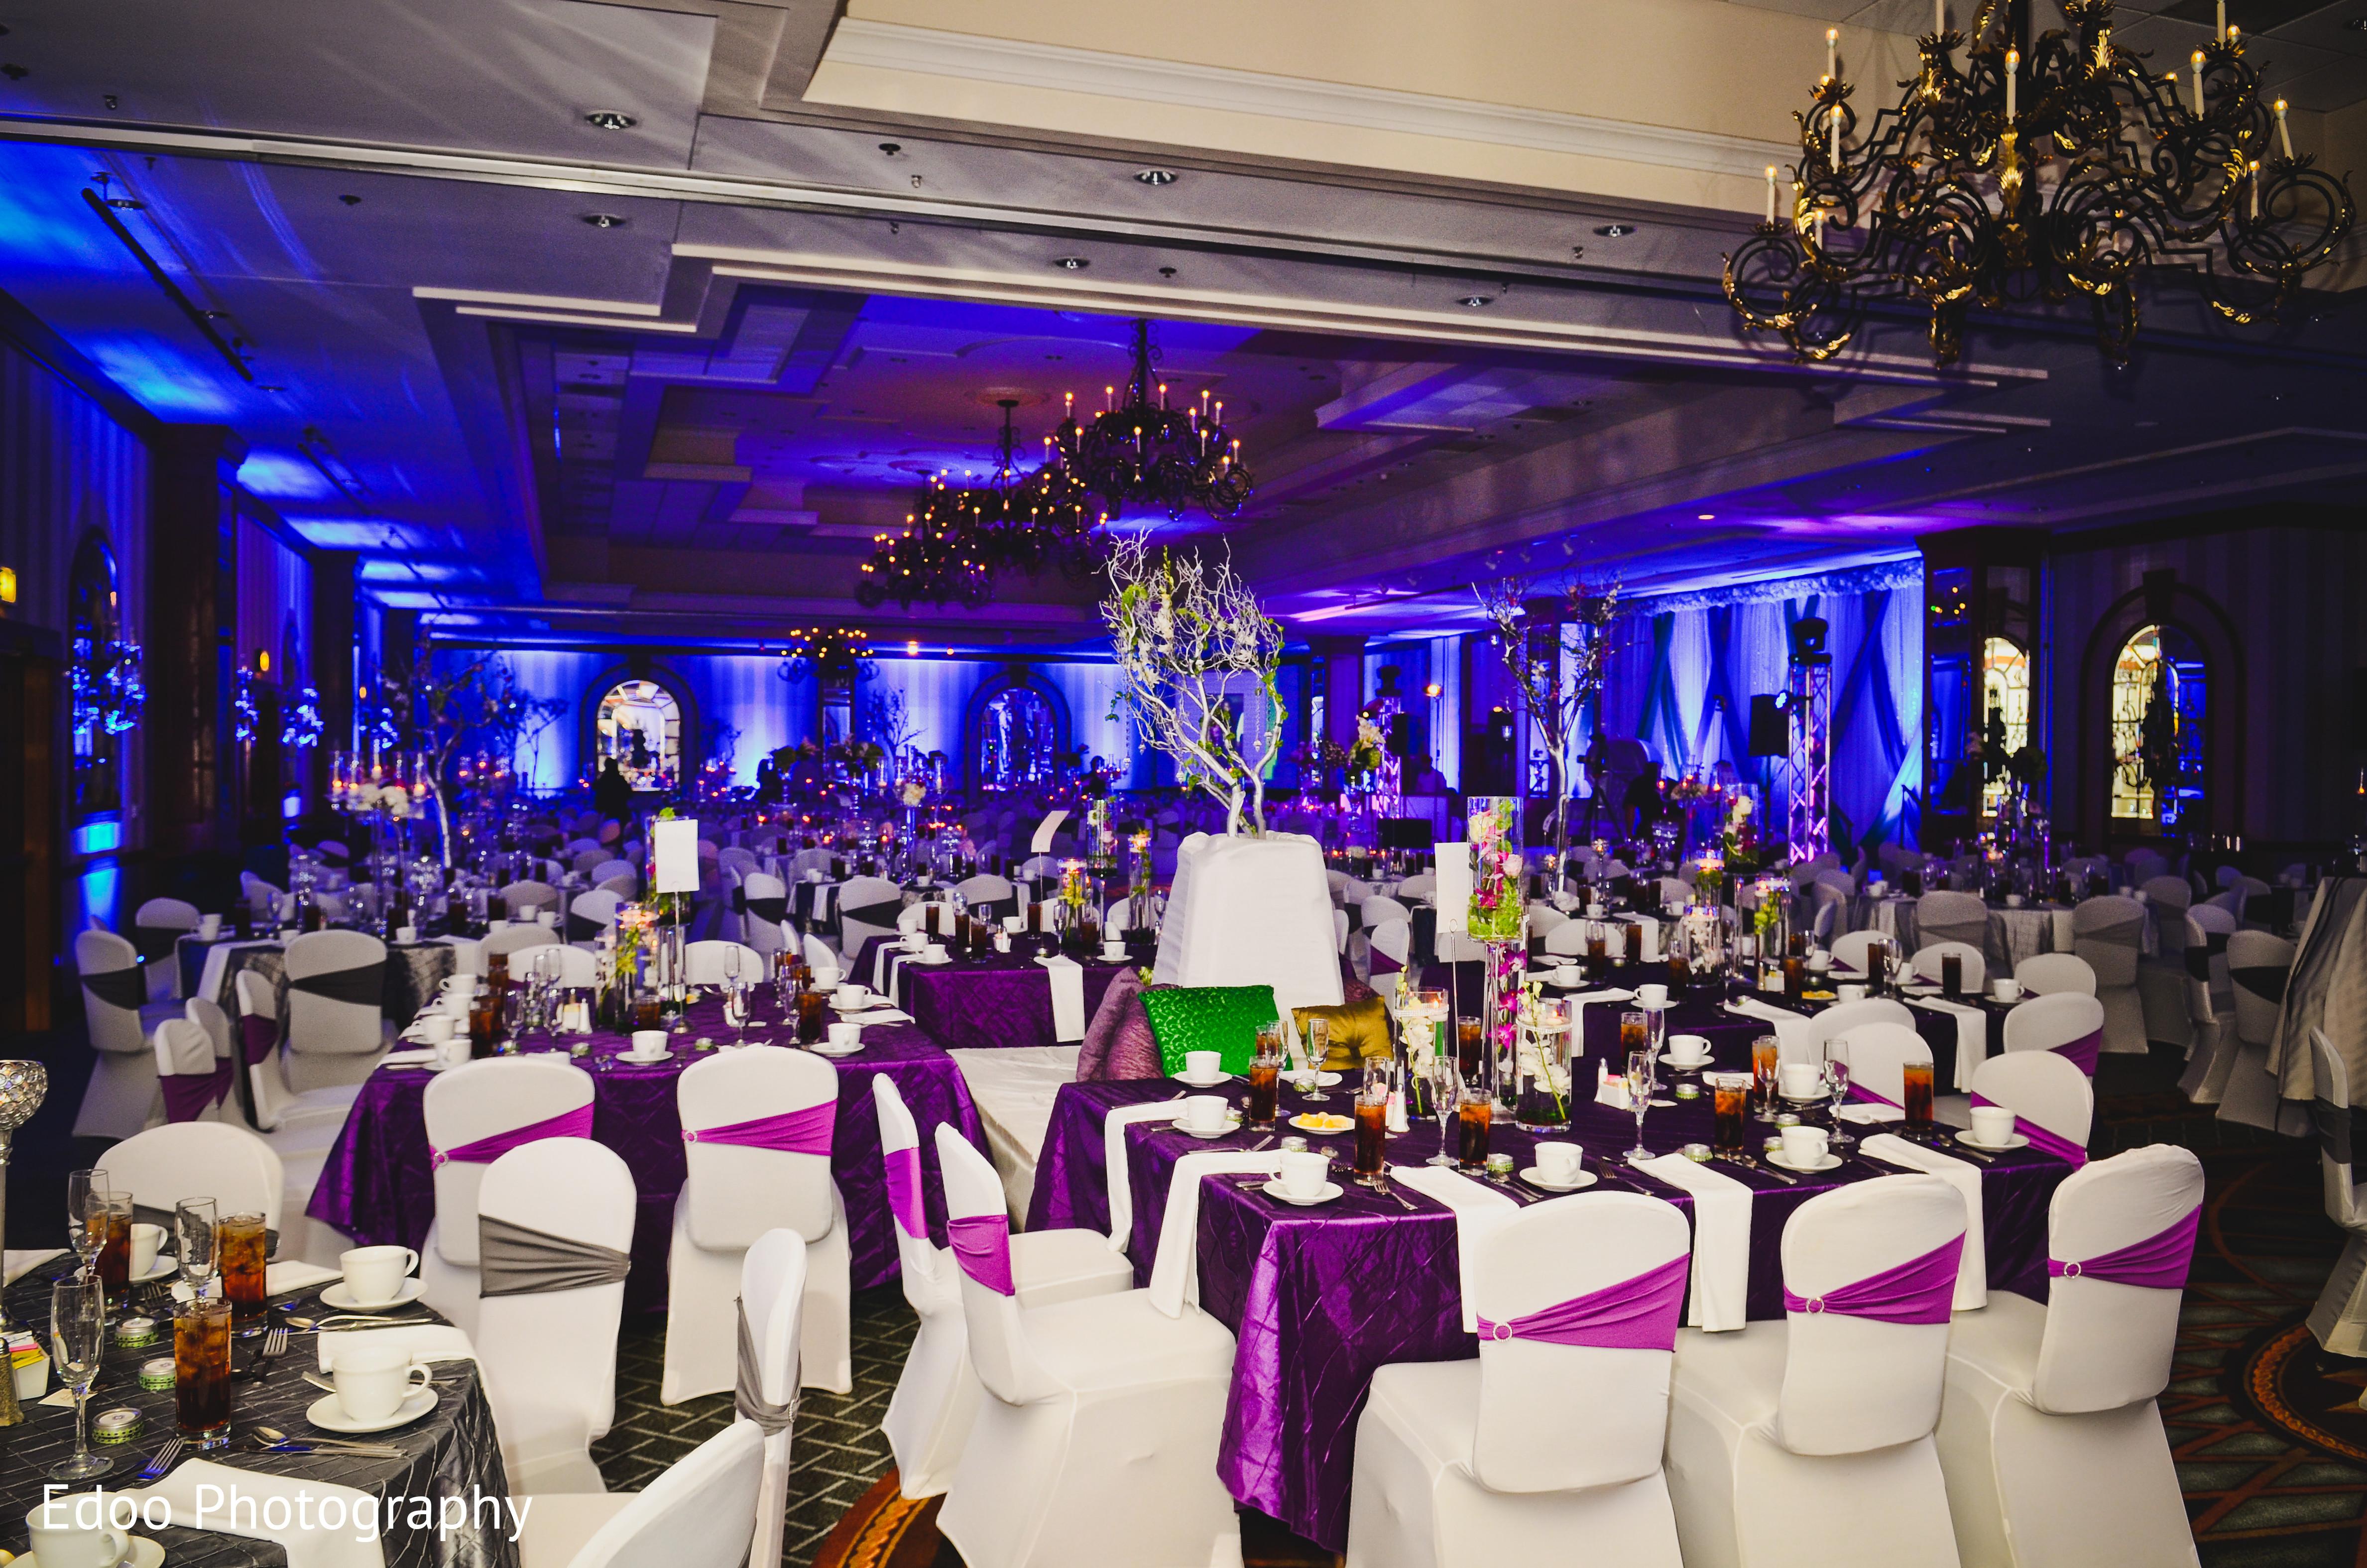 Reception Decor In San Antonio TX Indian Wedding By Edoo Photography